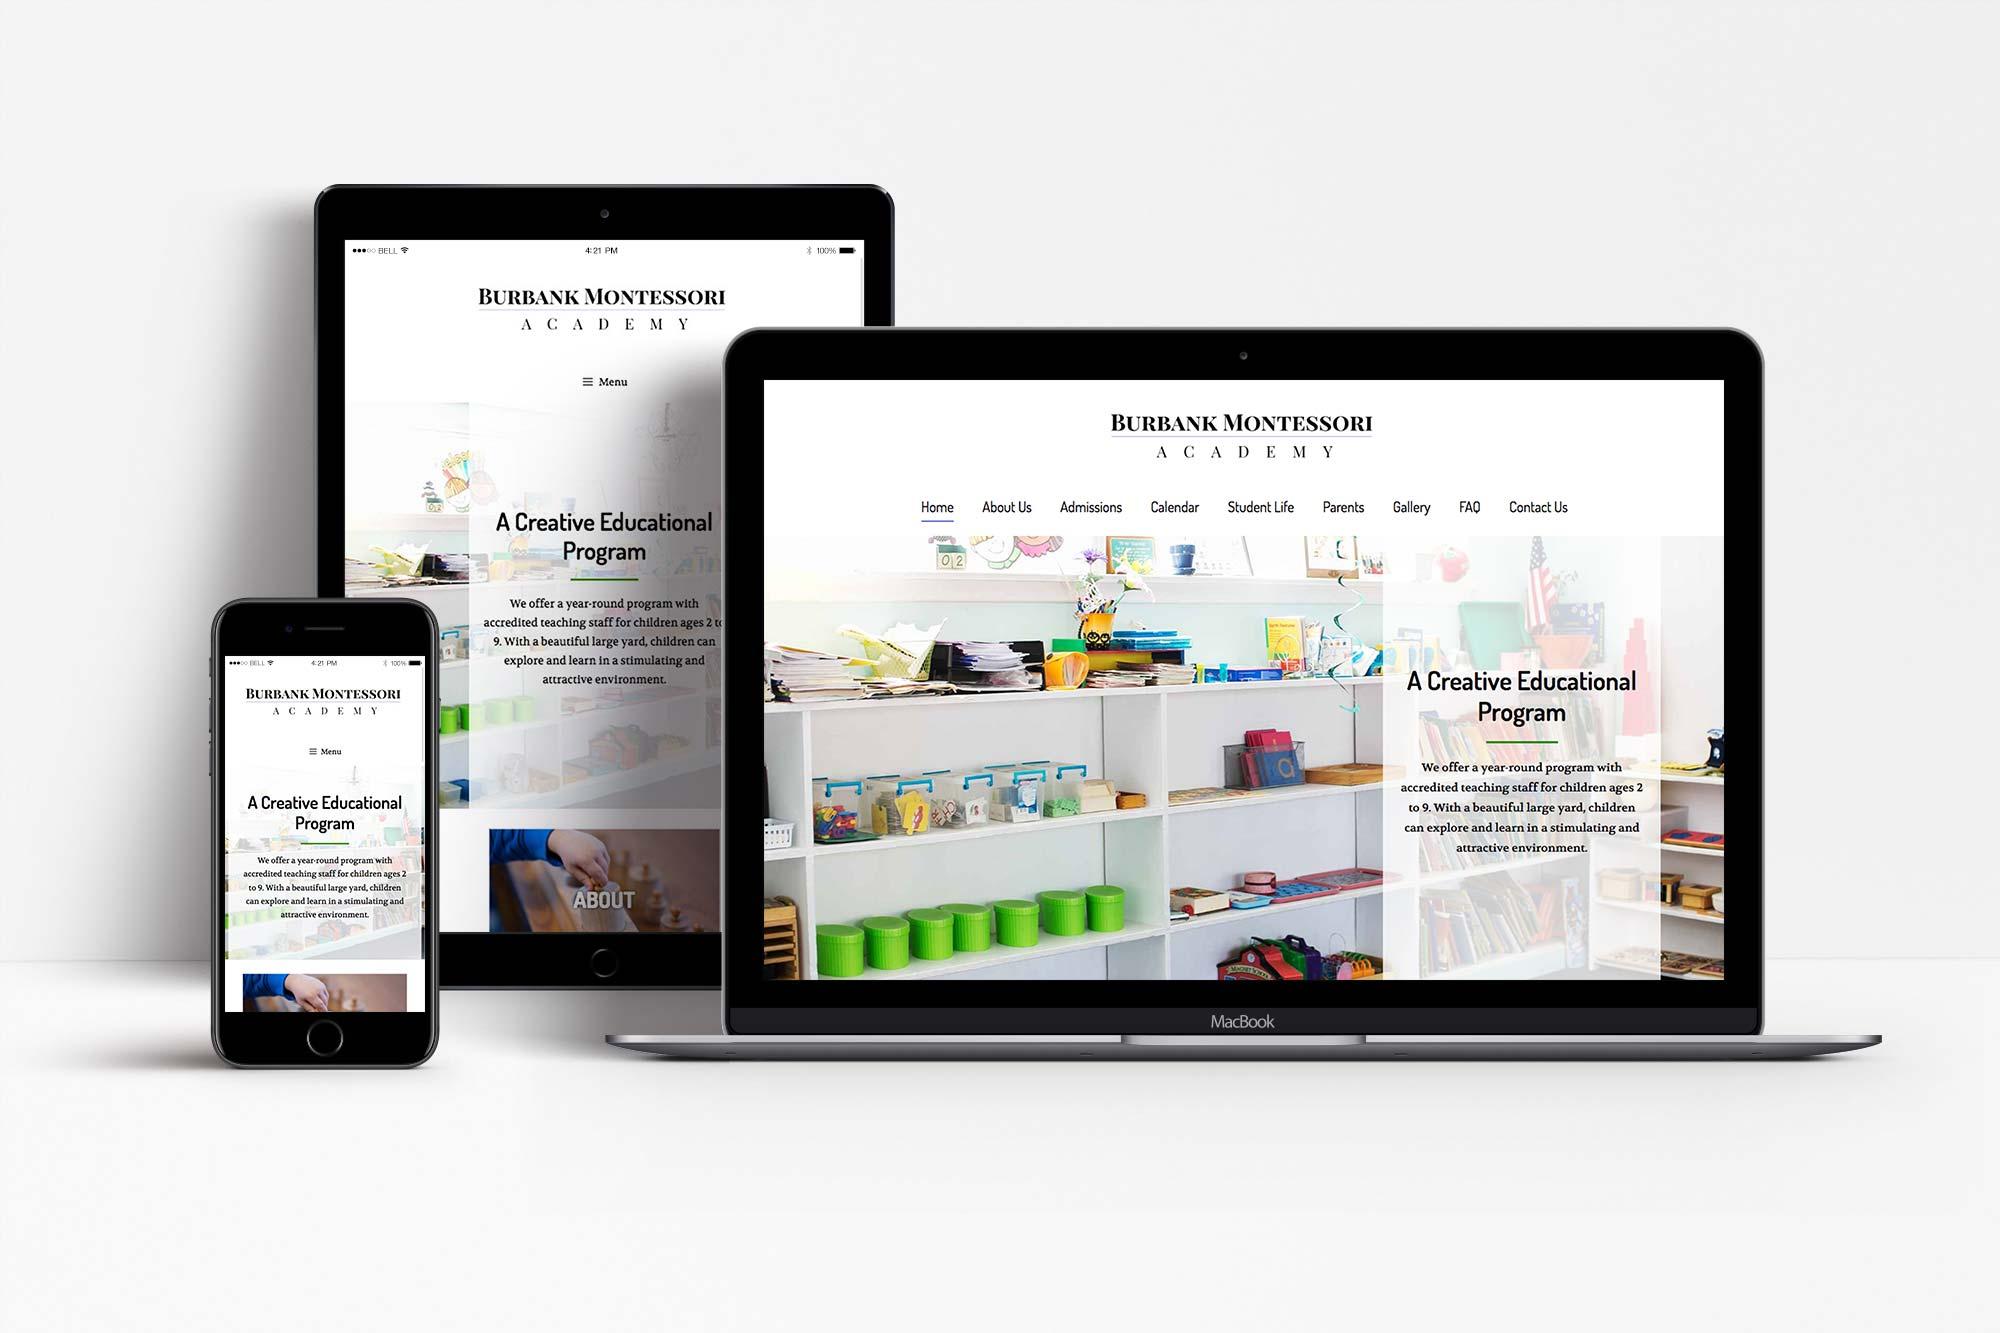 Burbank Montessori Academy responsive display